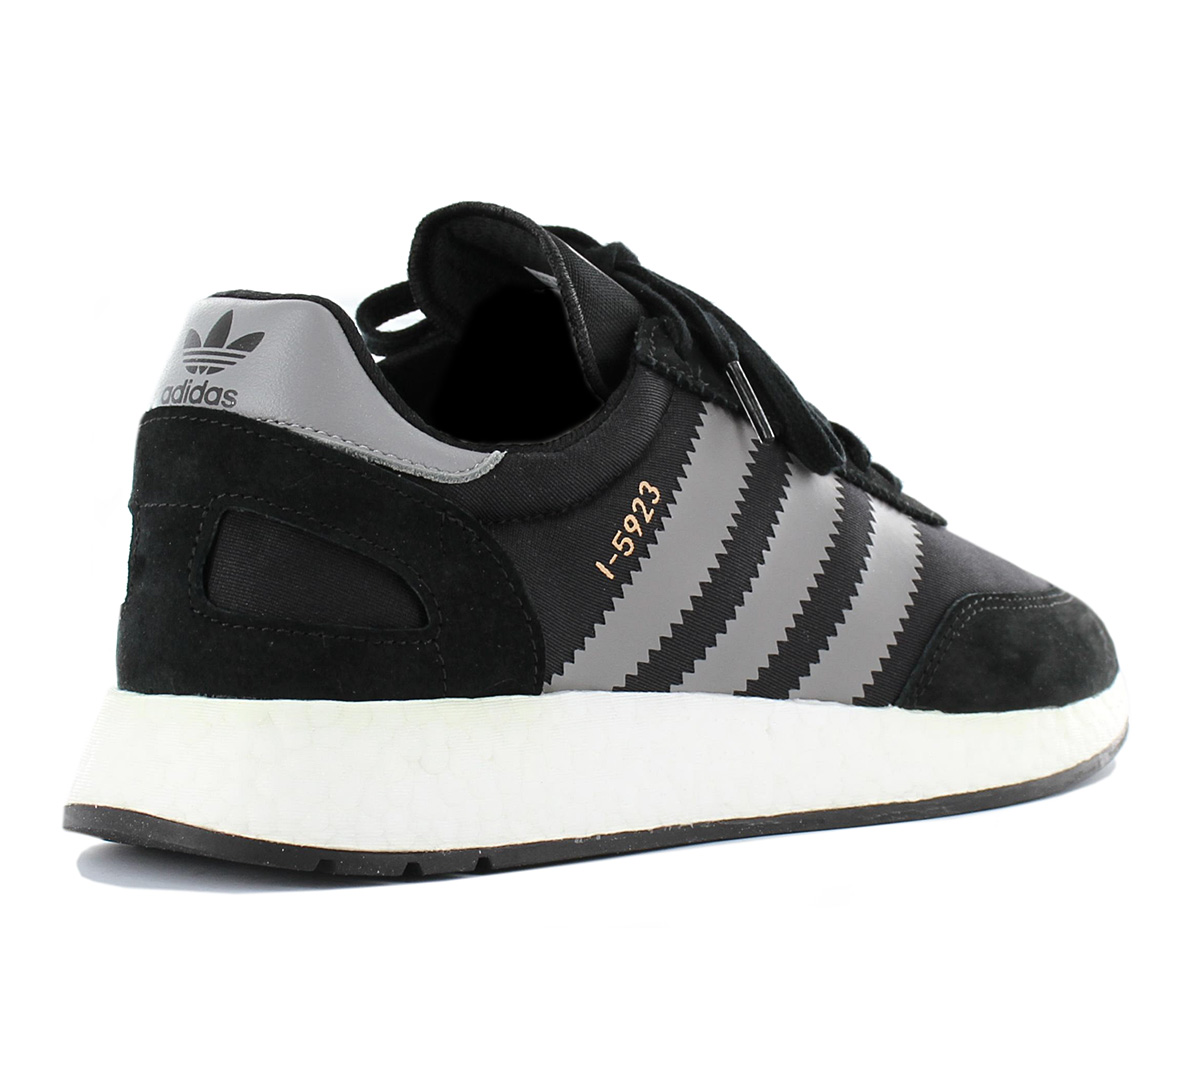 hot sale online 31af4 1ea88 Adidas Originals Iniki I-5923 Boost Mens Sneakers Shoes Blac